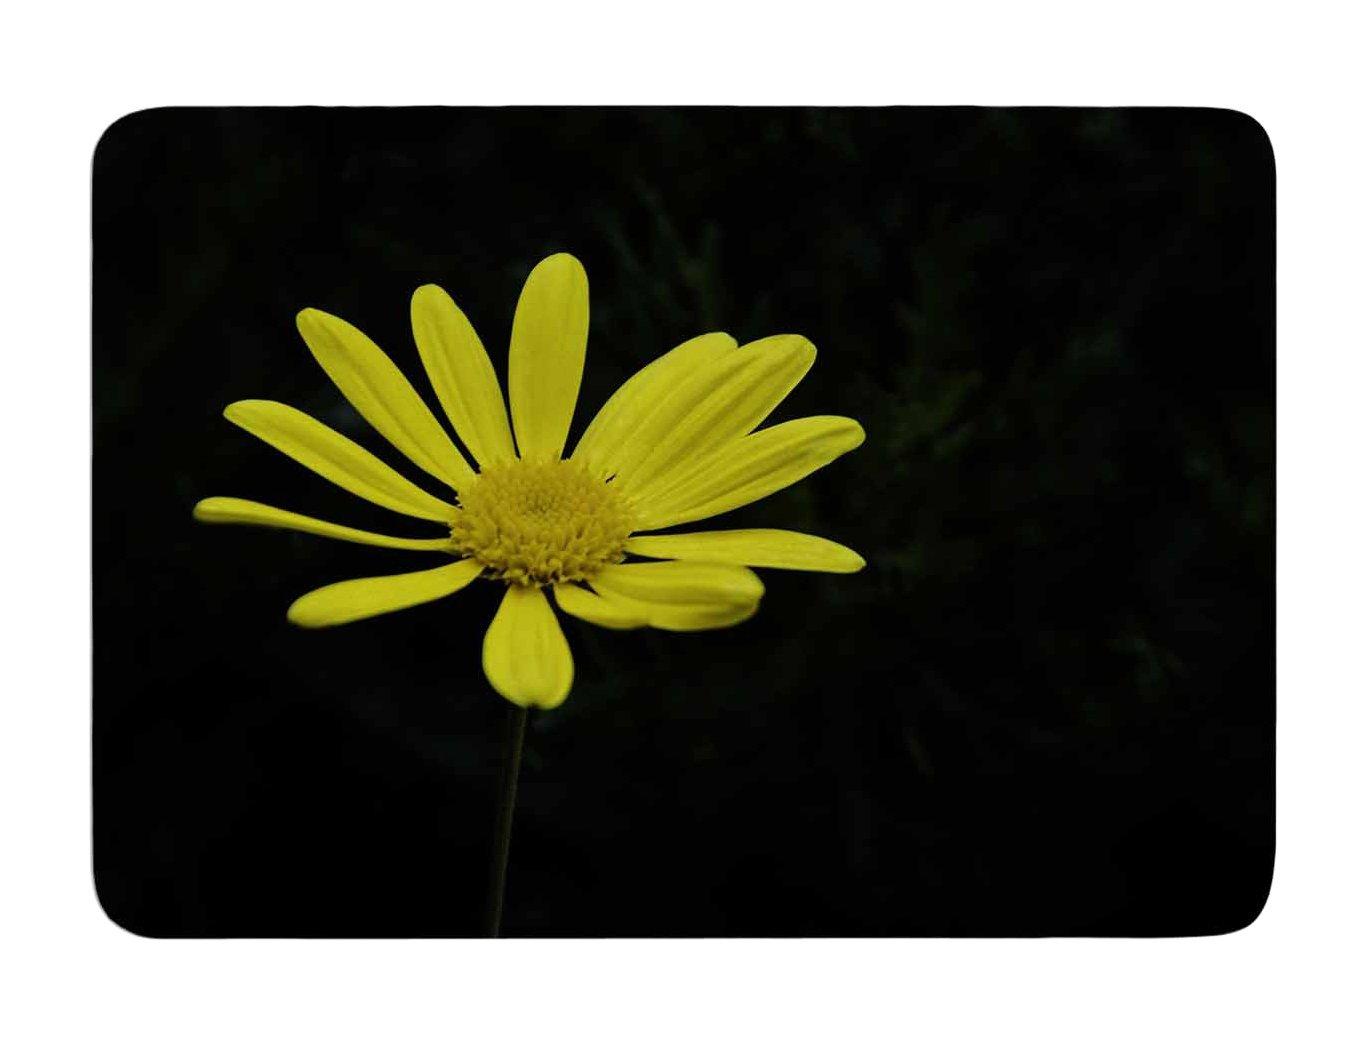 24 X 36 Kess InHouse Nick Nareshni Yellow Pedal Daisy Floral Photography Memory Foam Bath Mat 24 by 36-Inch